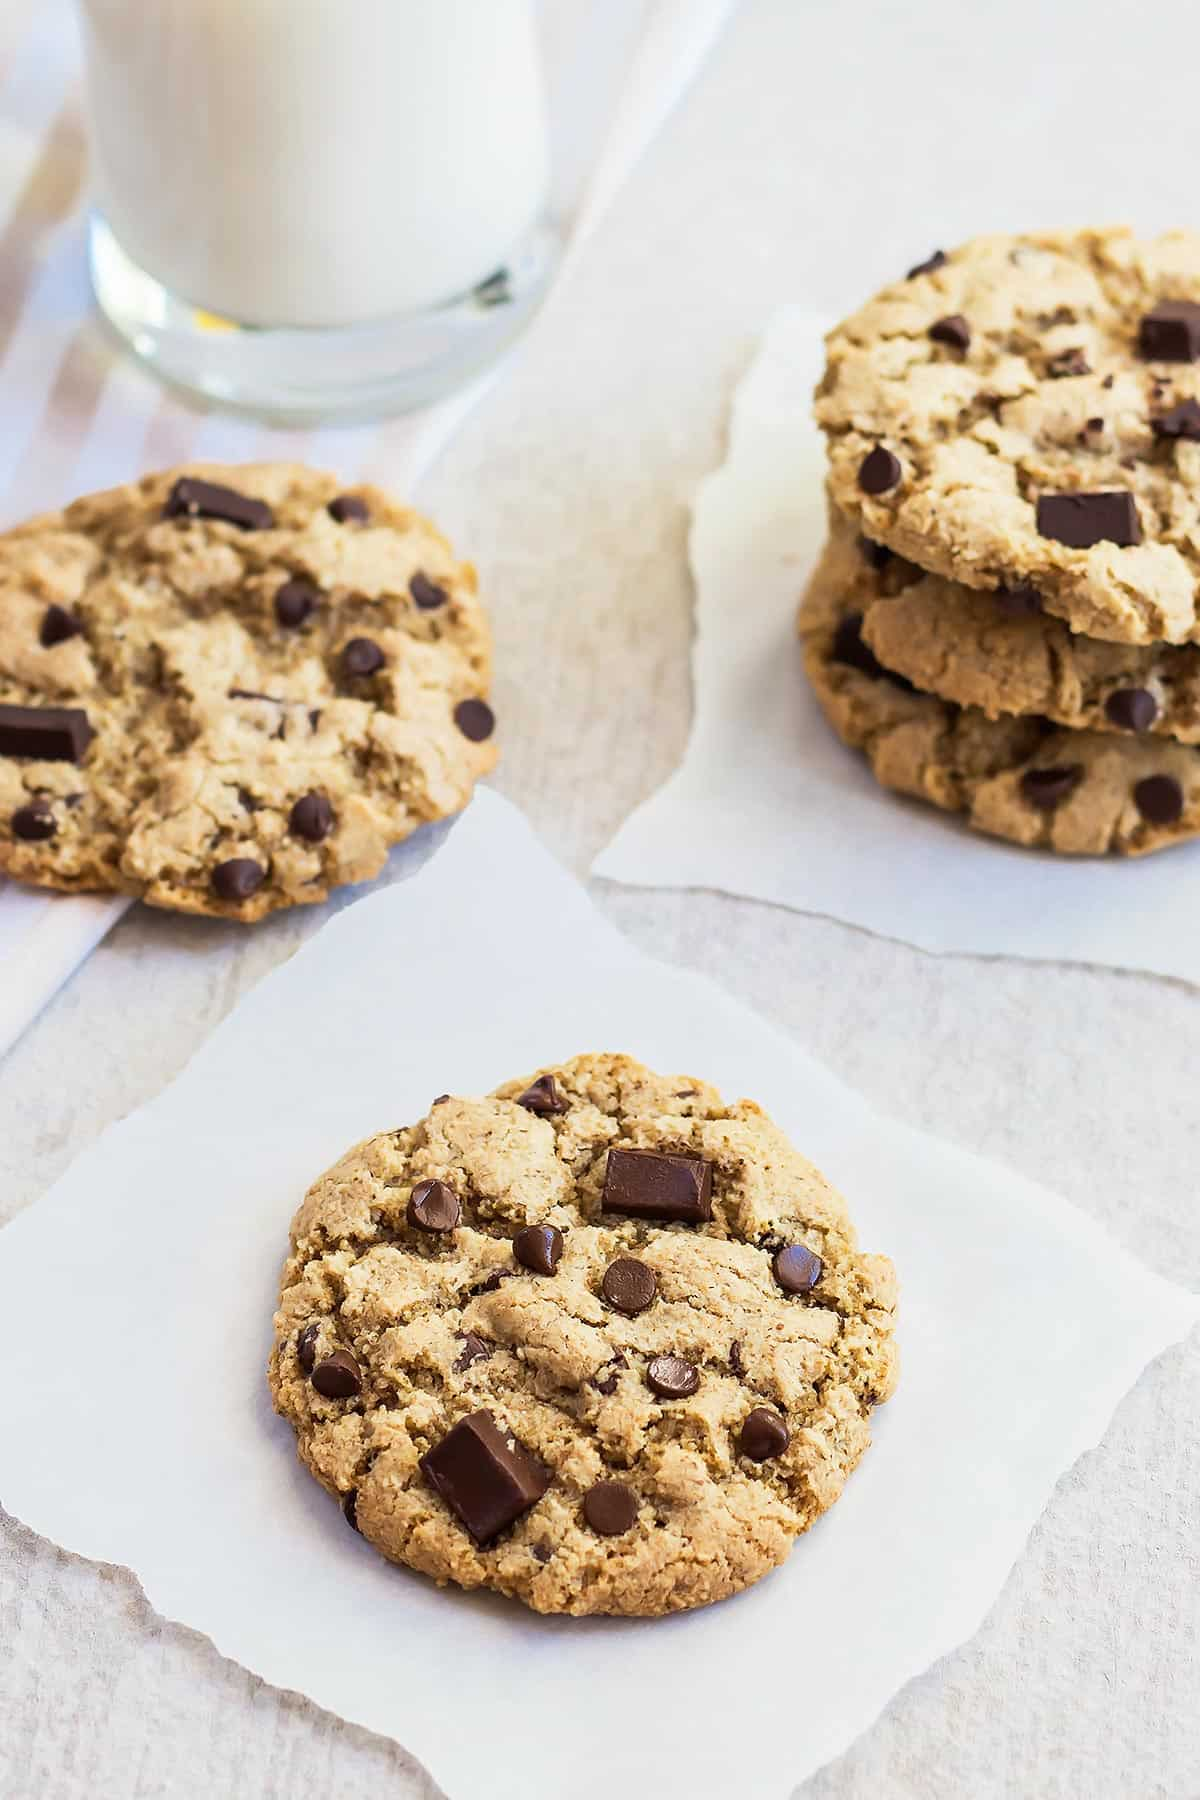 Tigernut Flour Recipes for Cookies